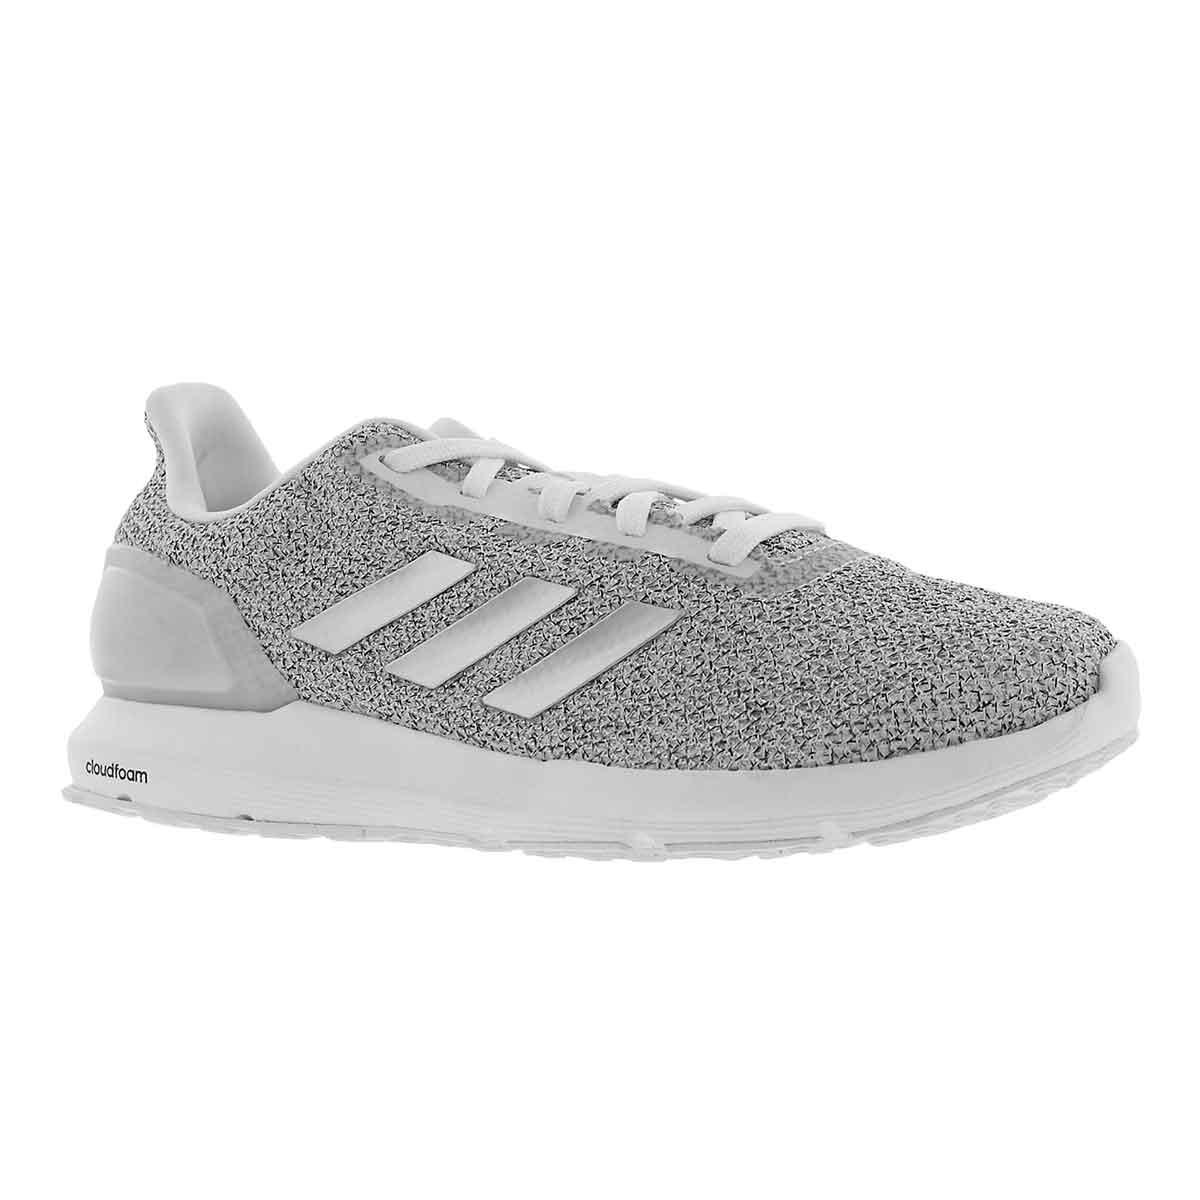 Women's COSMIC 2 SL white/silver running shoes